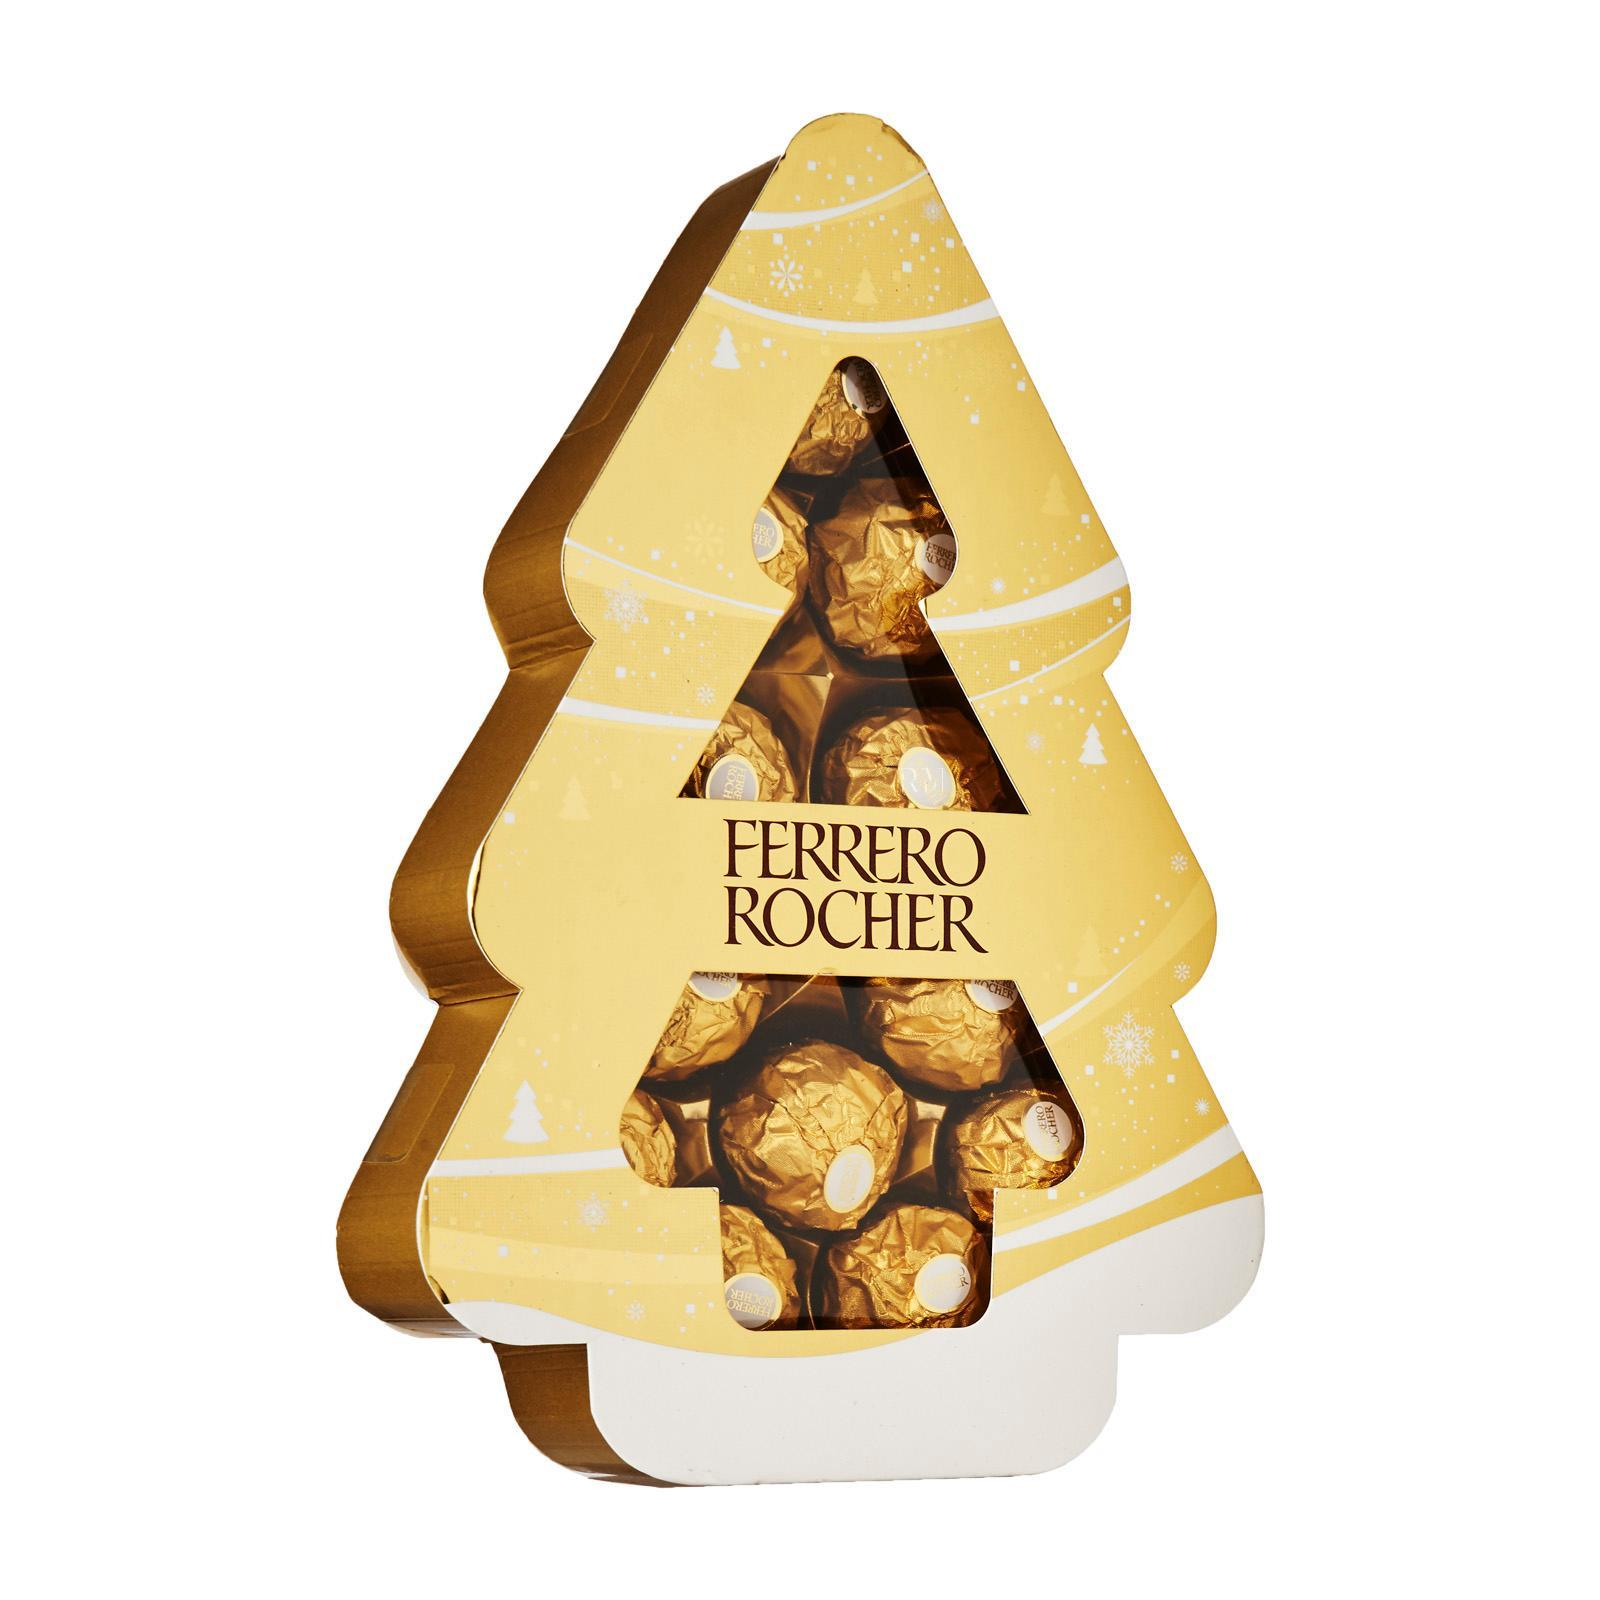 Ferrero Rocher Christmas Tree Chocolates - Christmas Special